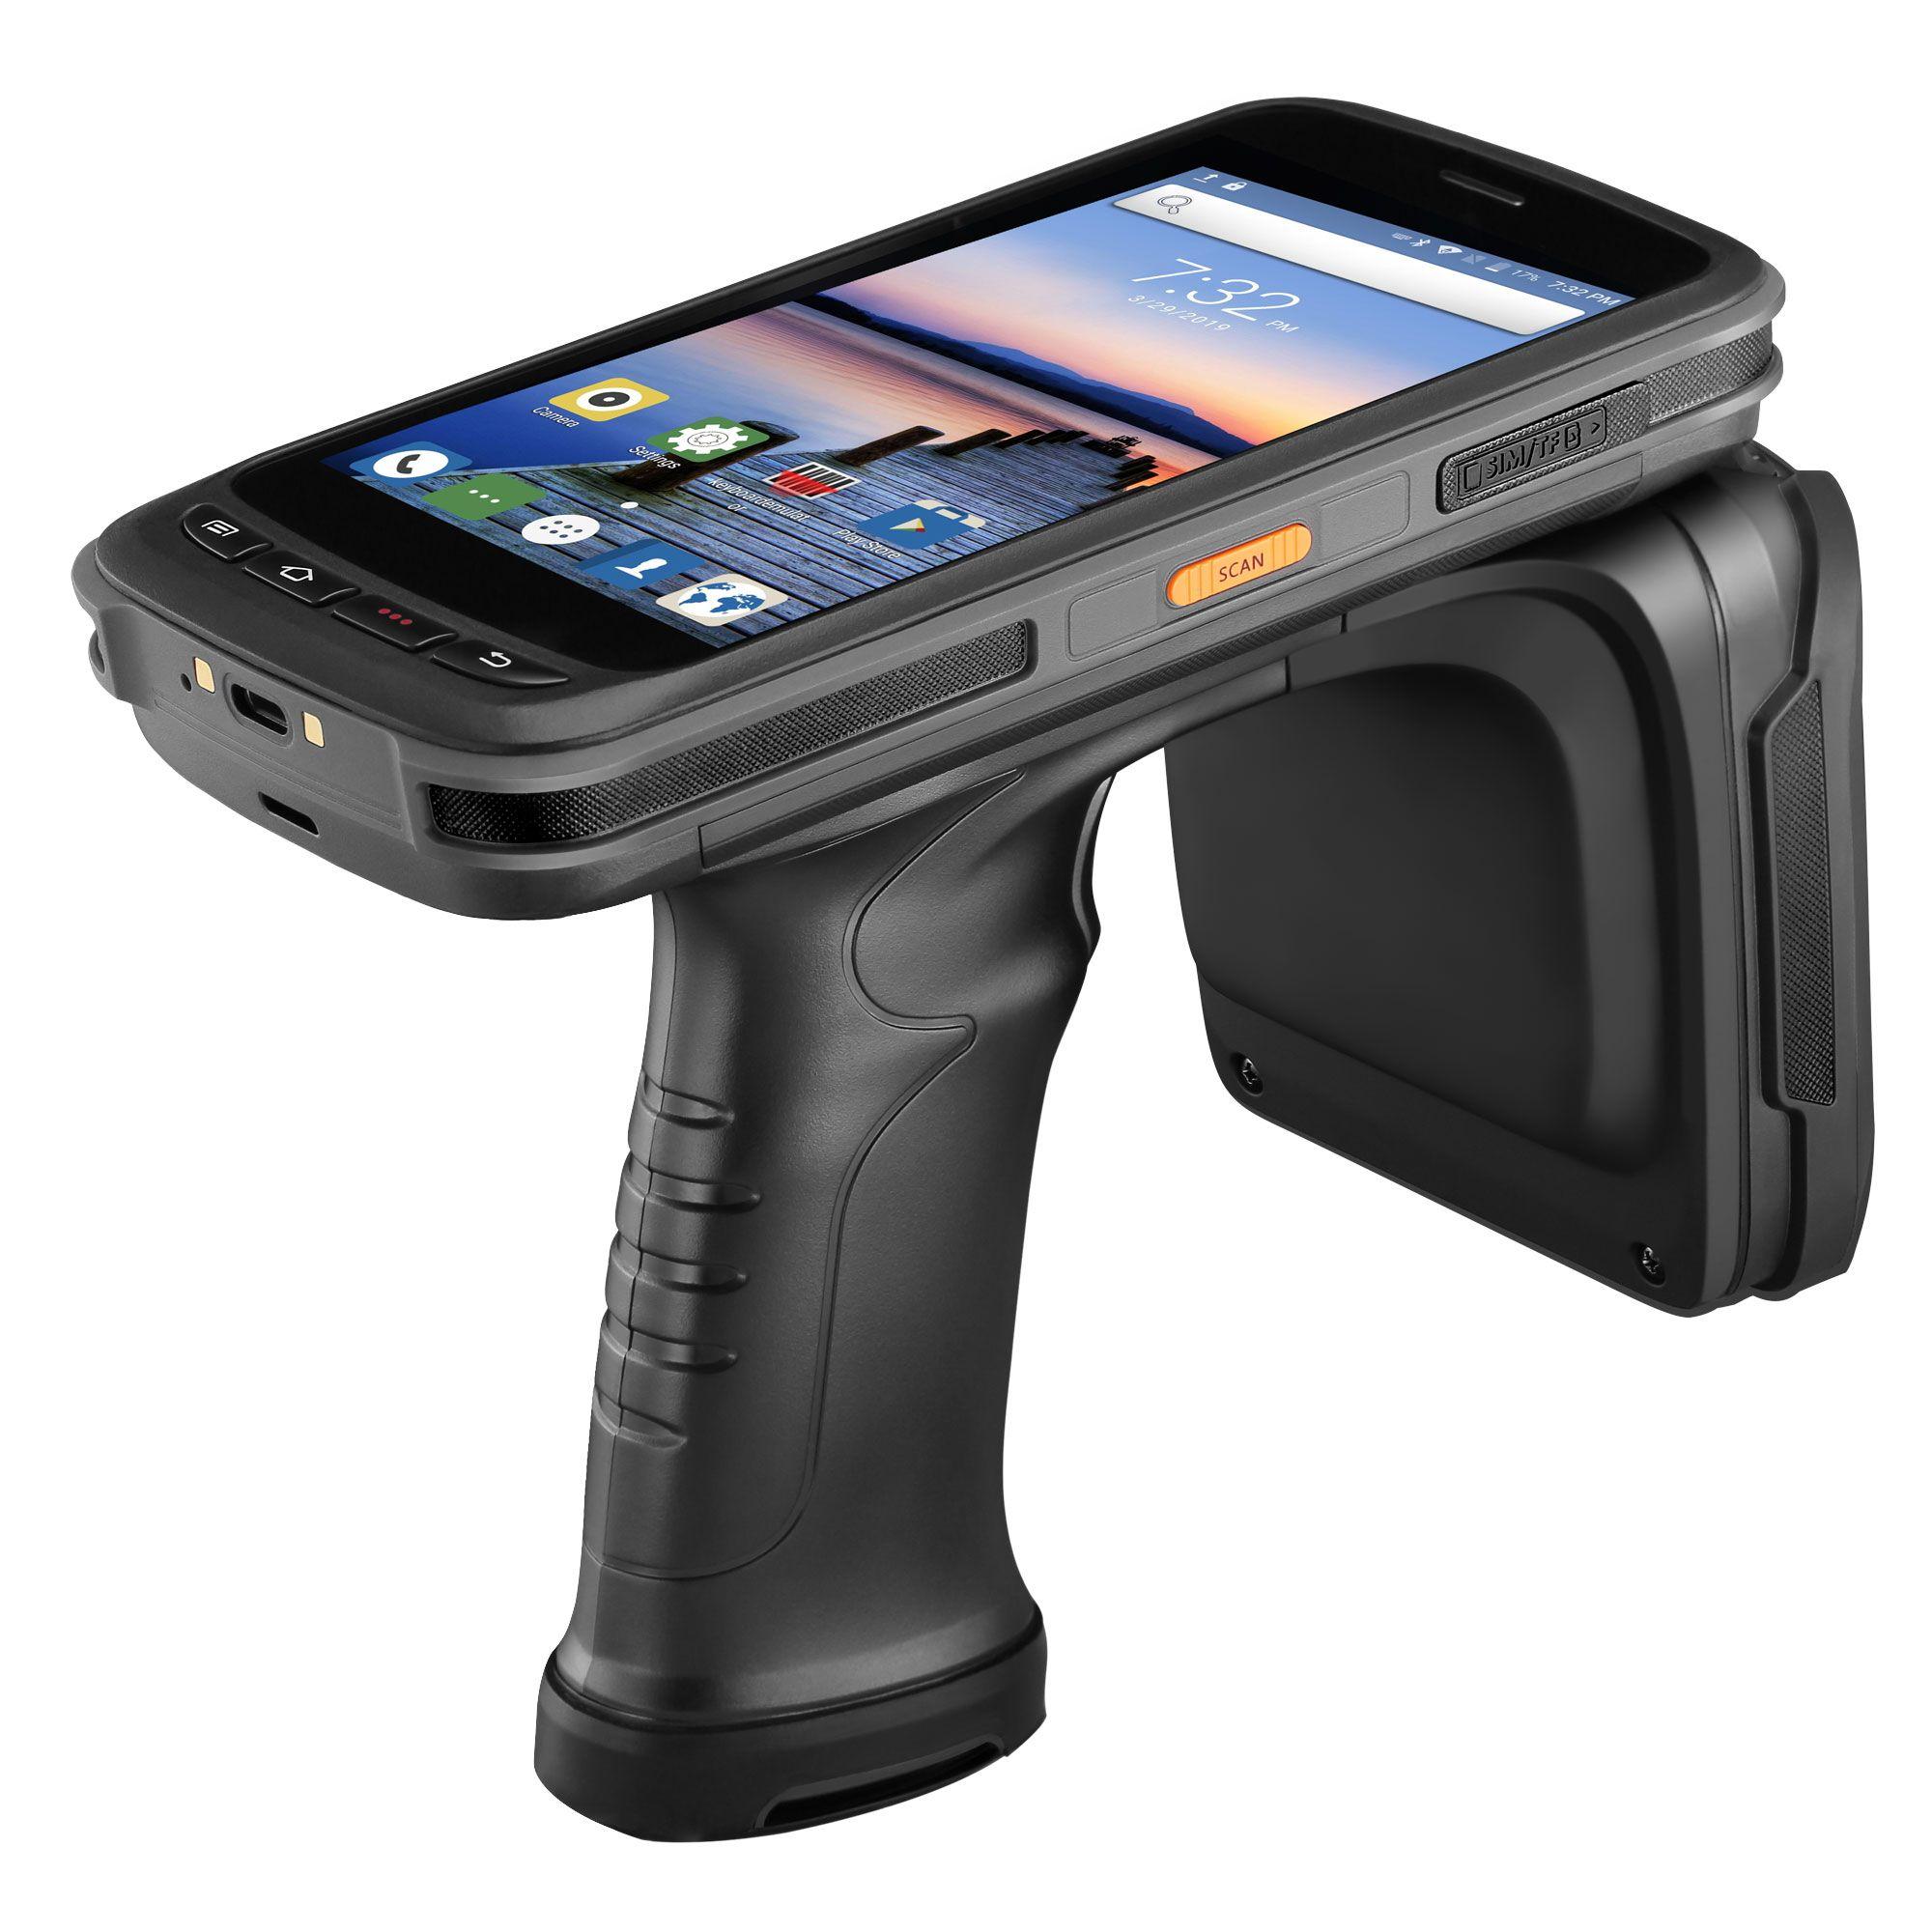 IssyzonePOS Robuste PDA Handheld Android POS Terminal Zebra barcode Scanner 2D NFC 4G WiFi daten sammler UHF RFID Leser